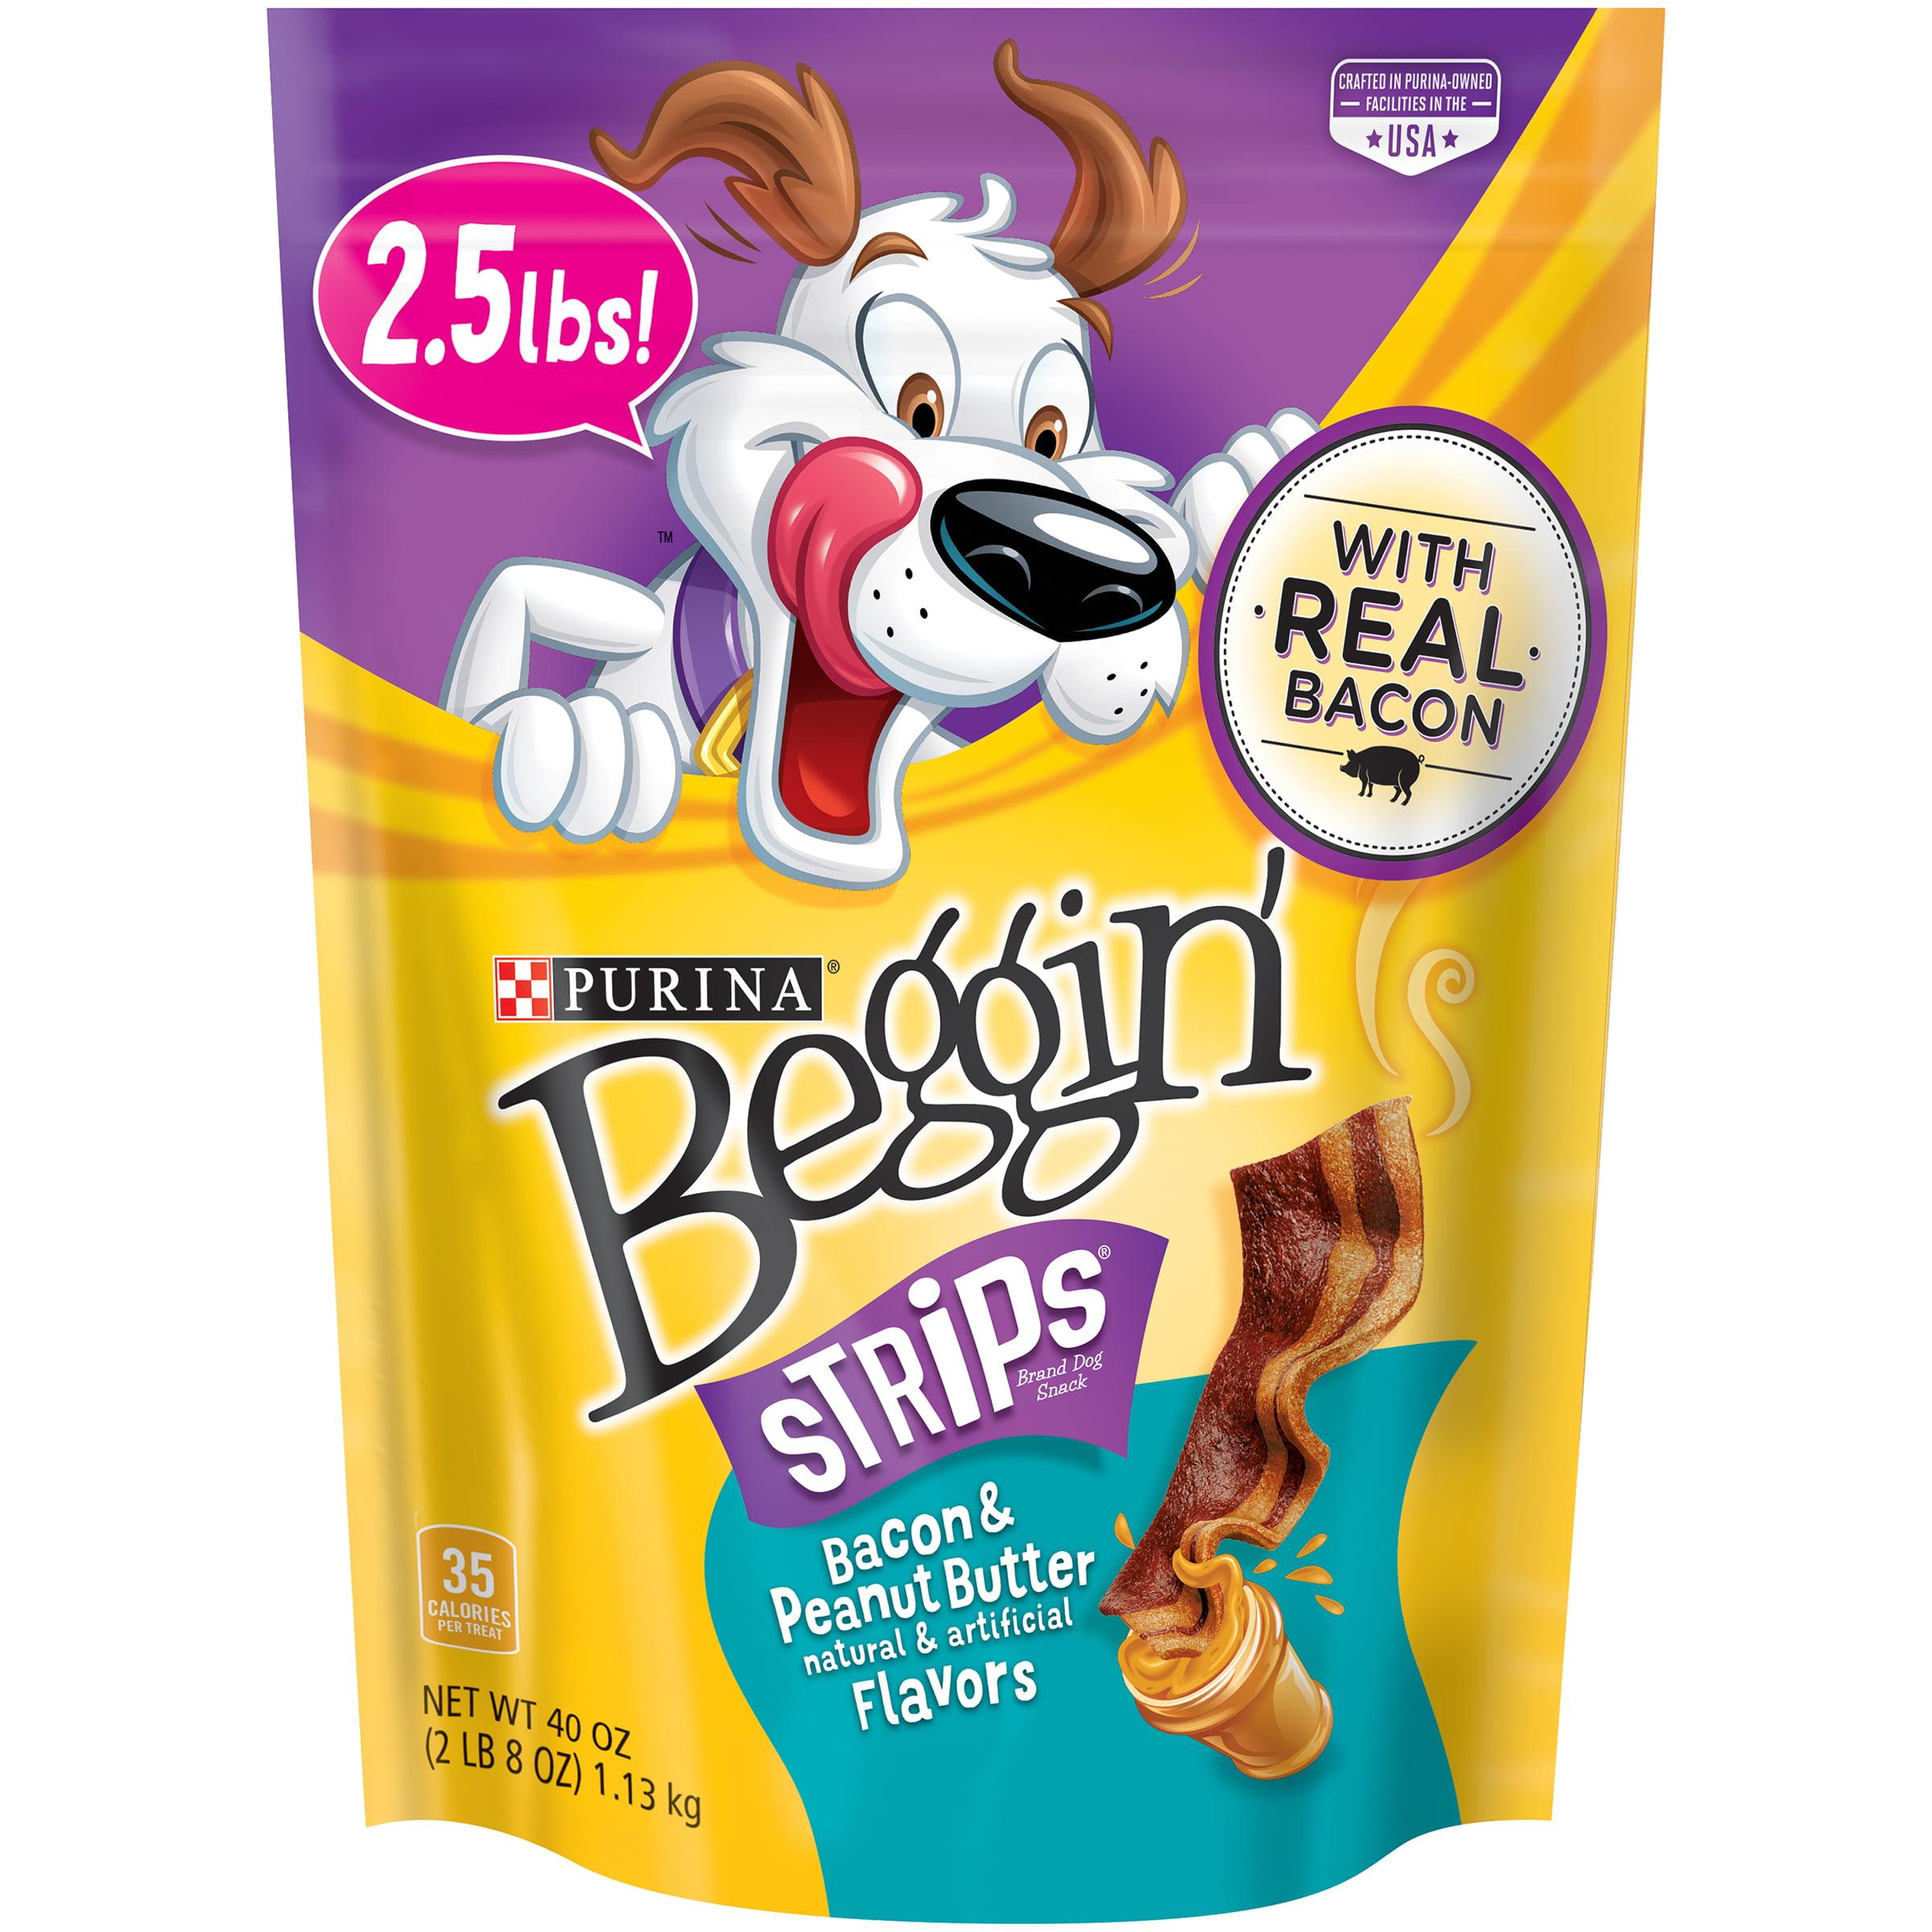 Purina Beggin Strips Bacon & Peanut Butter Flavors Dog Treats, 40 Oz. by Nestle Purina Petcare